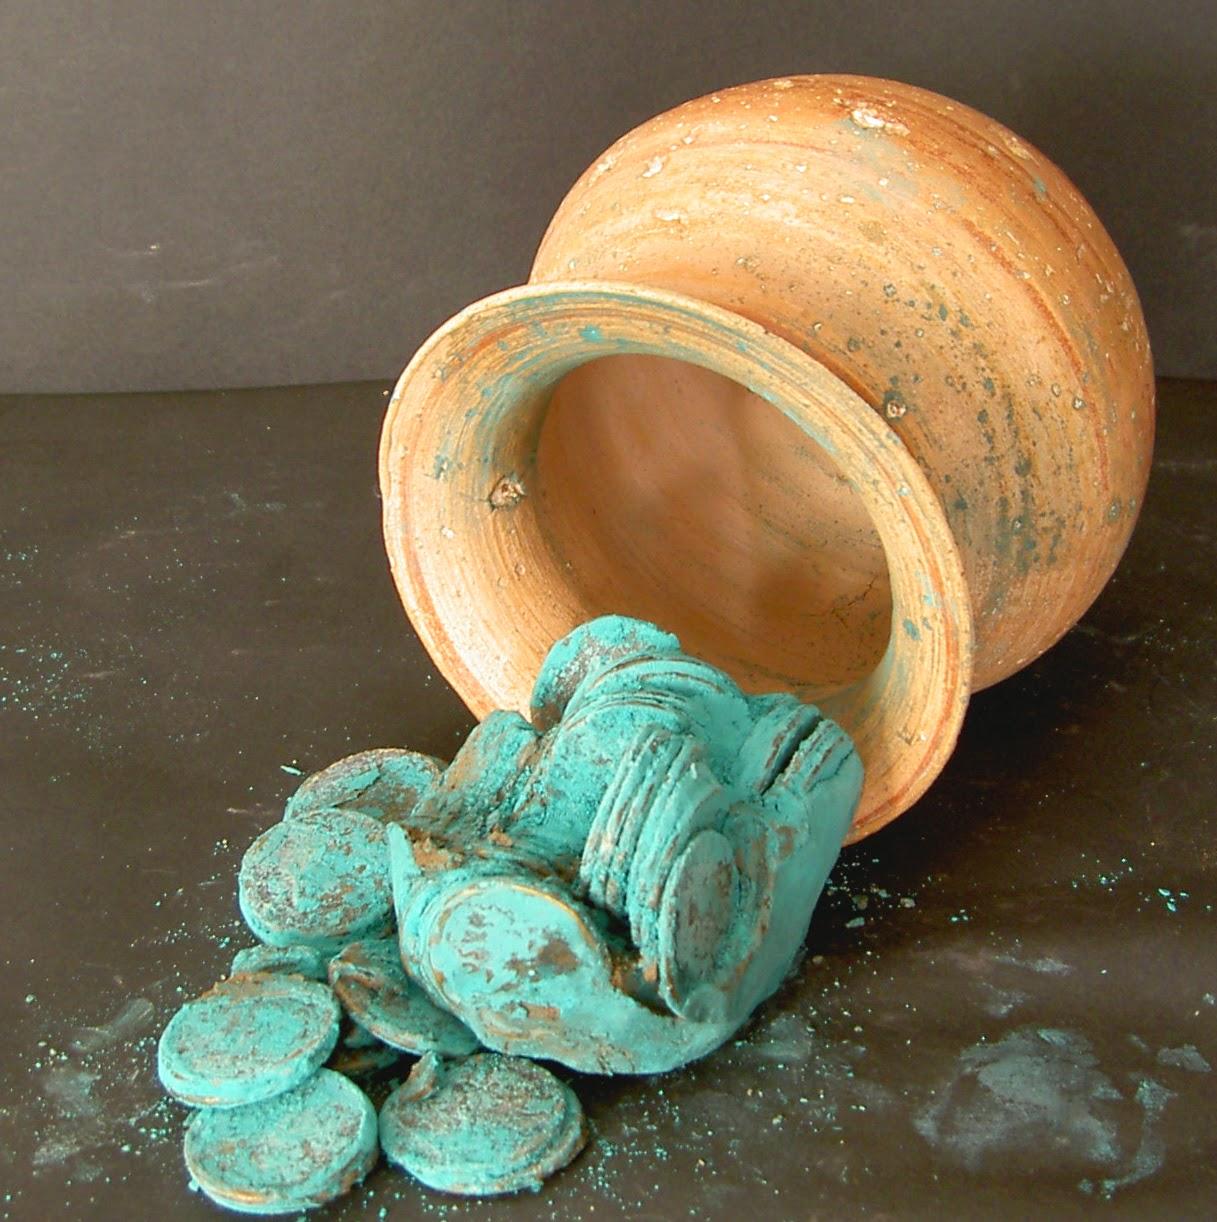 Tesoro romano de monedas de bronce